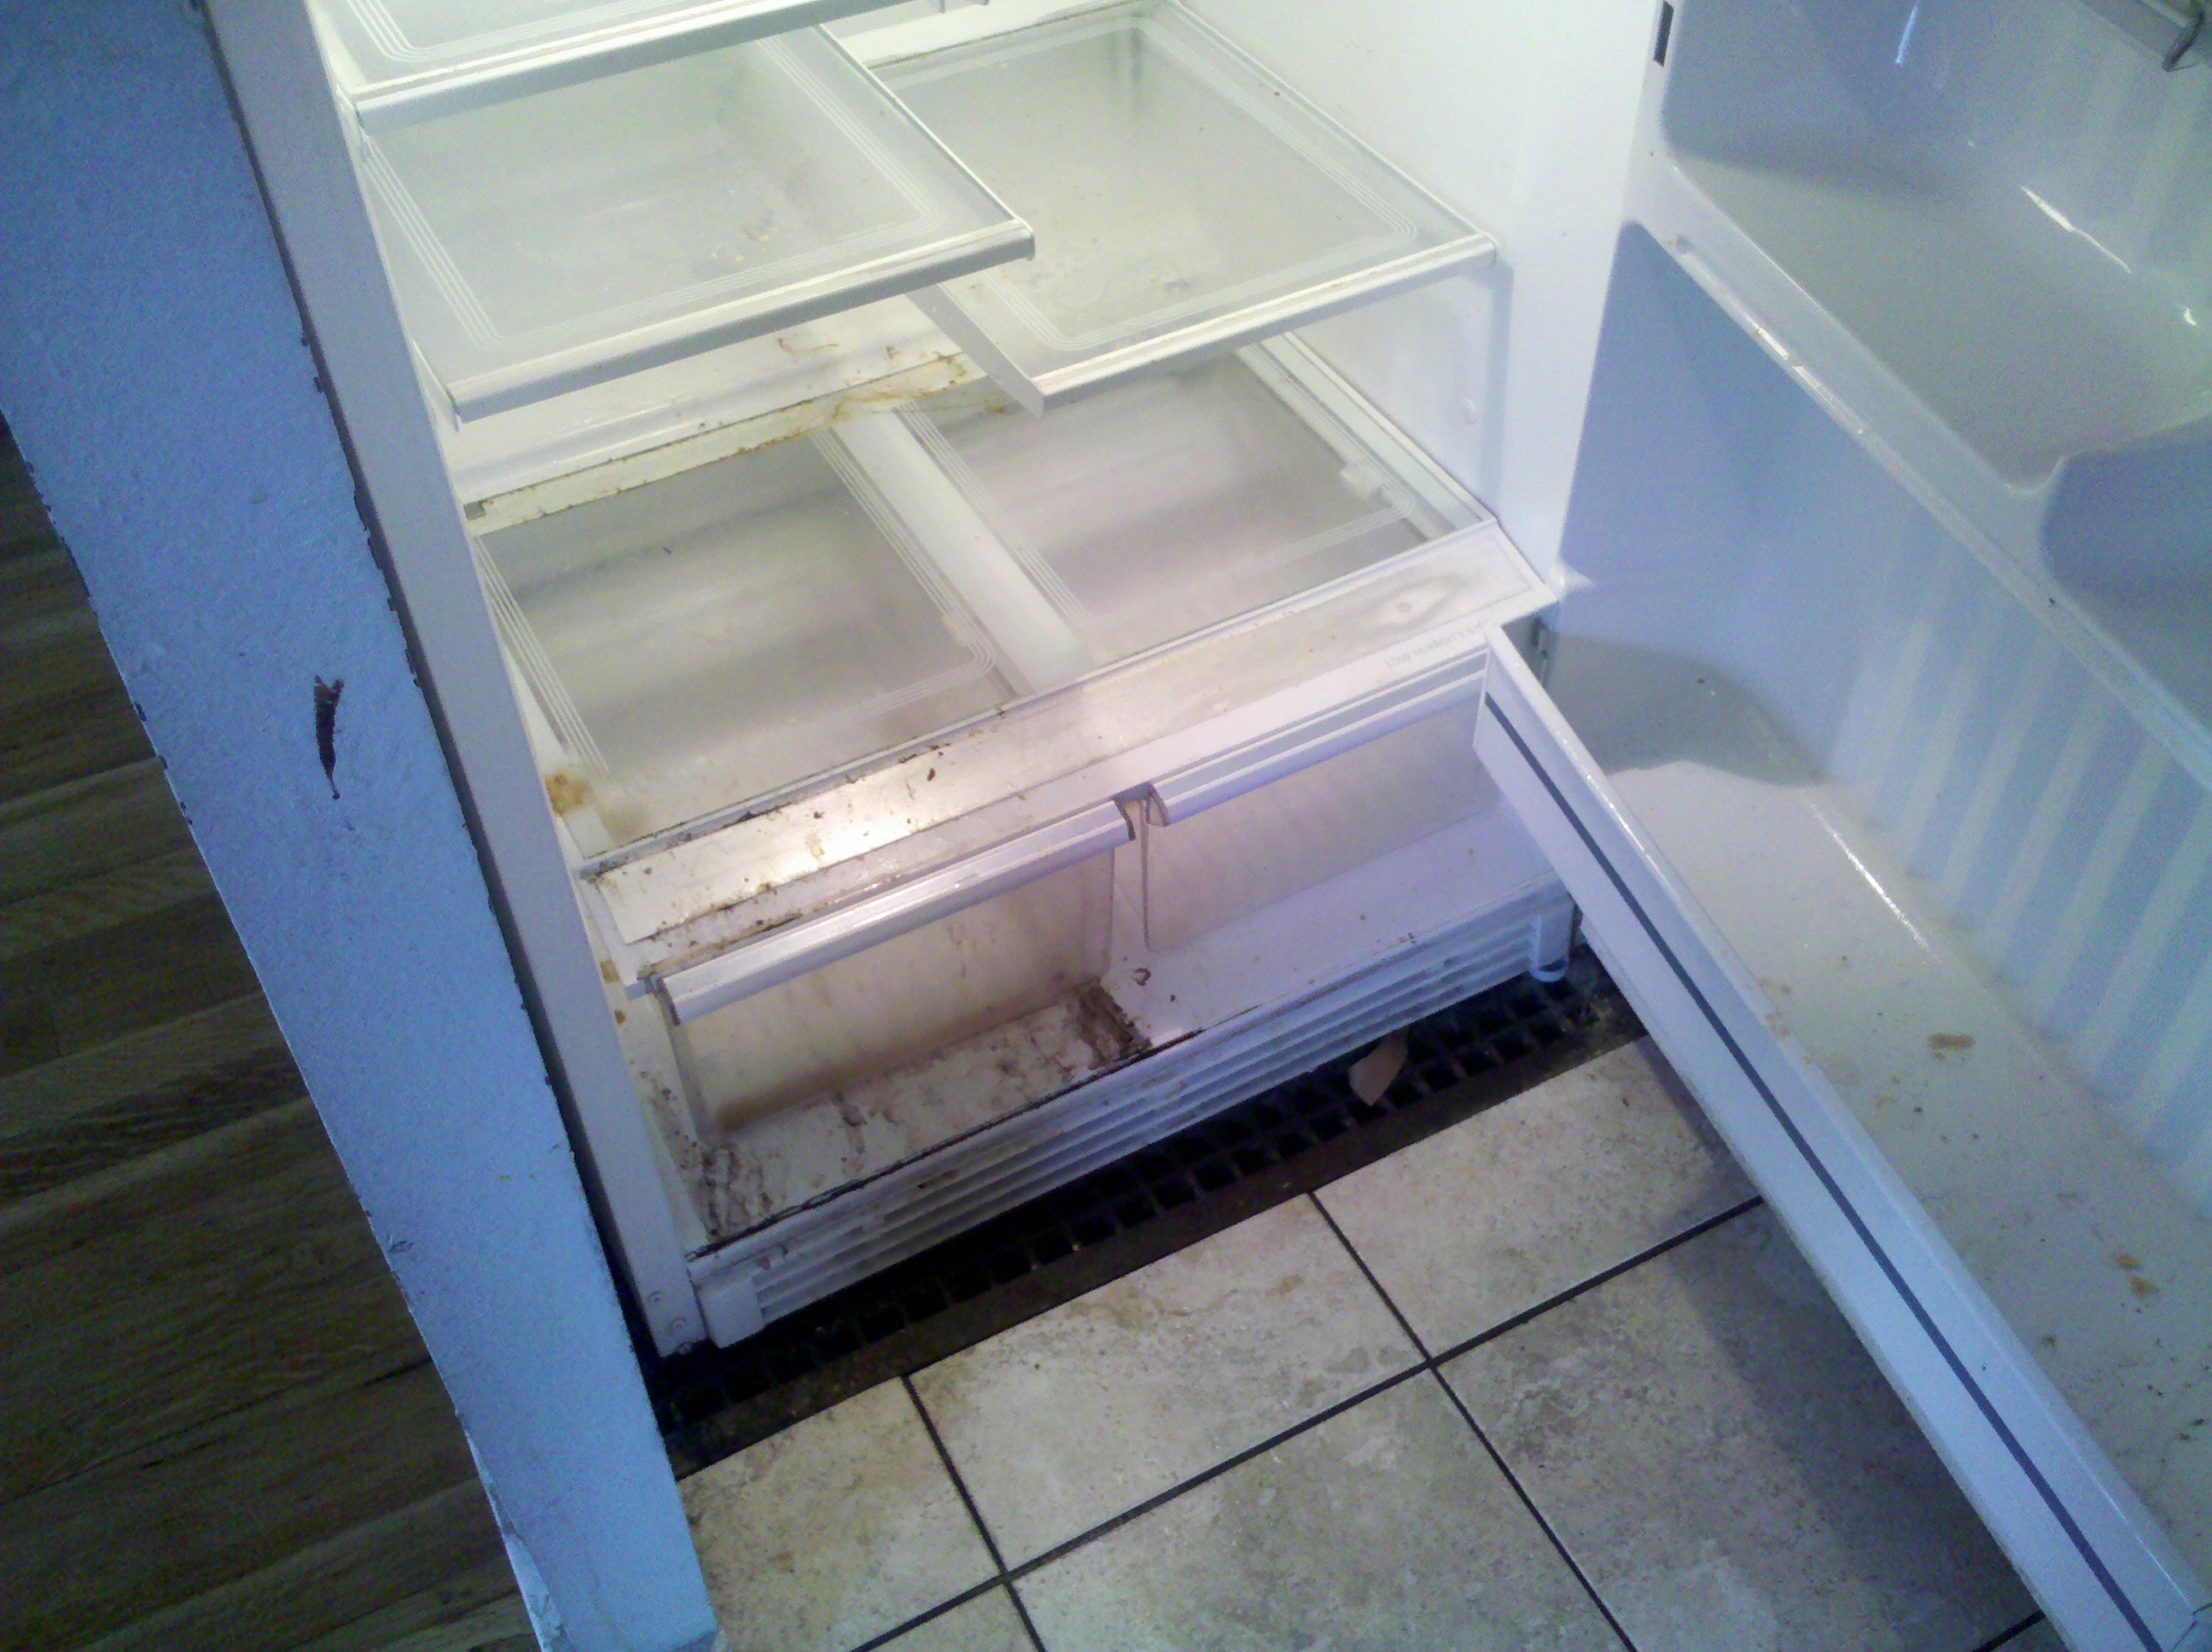 Worst fridge - 2014